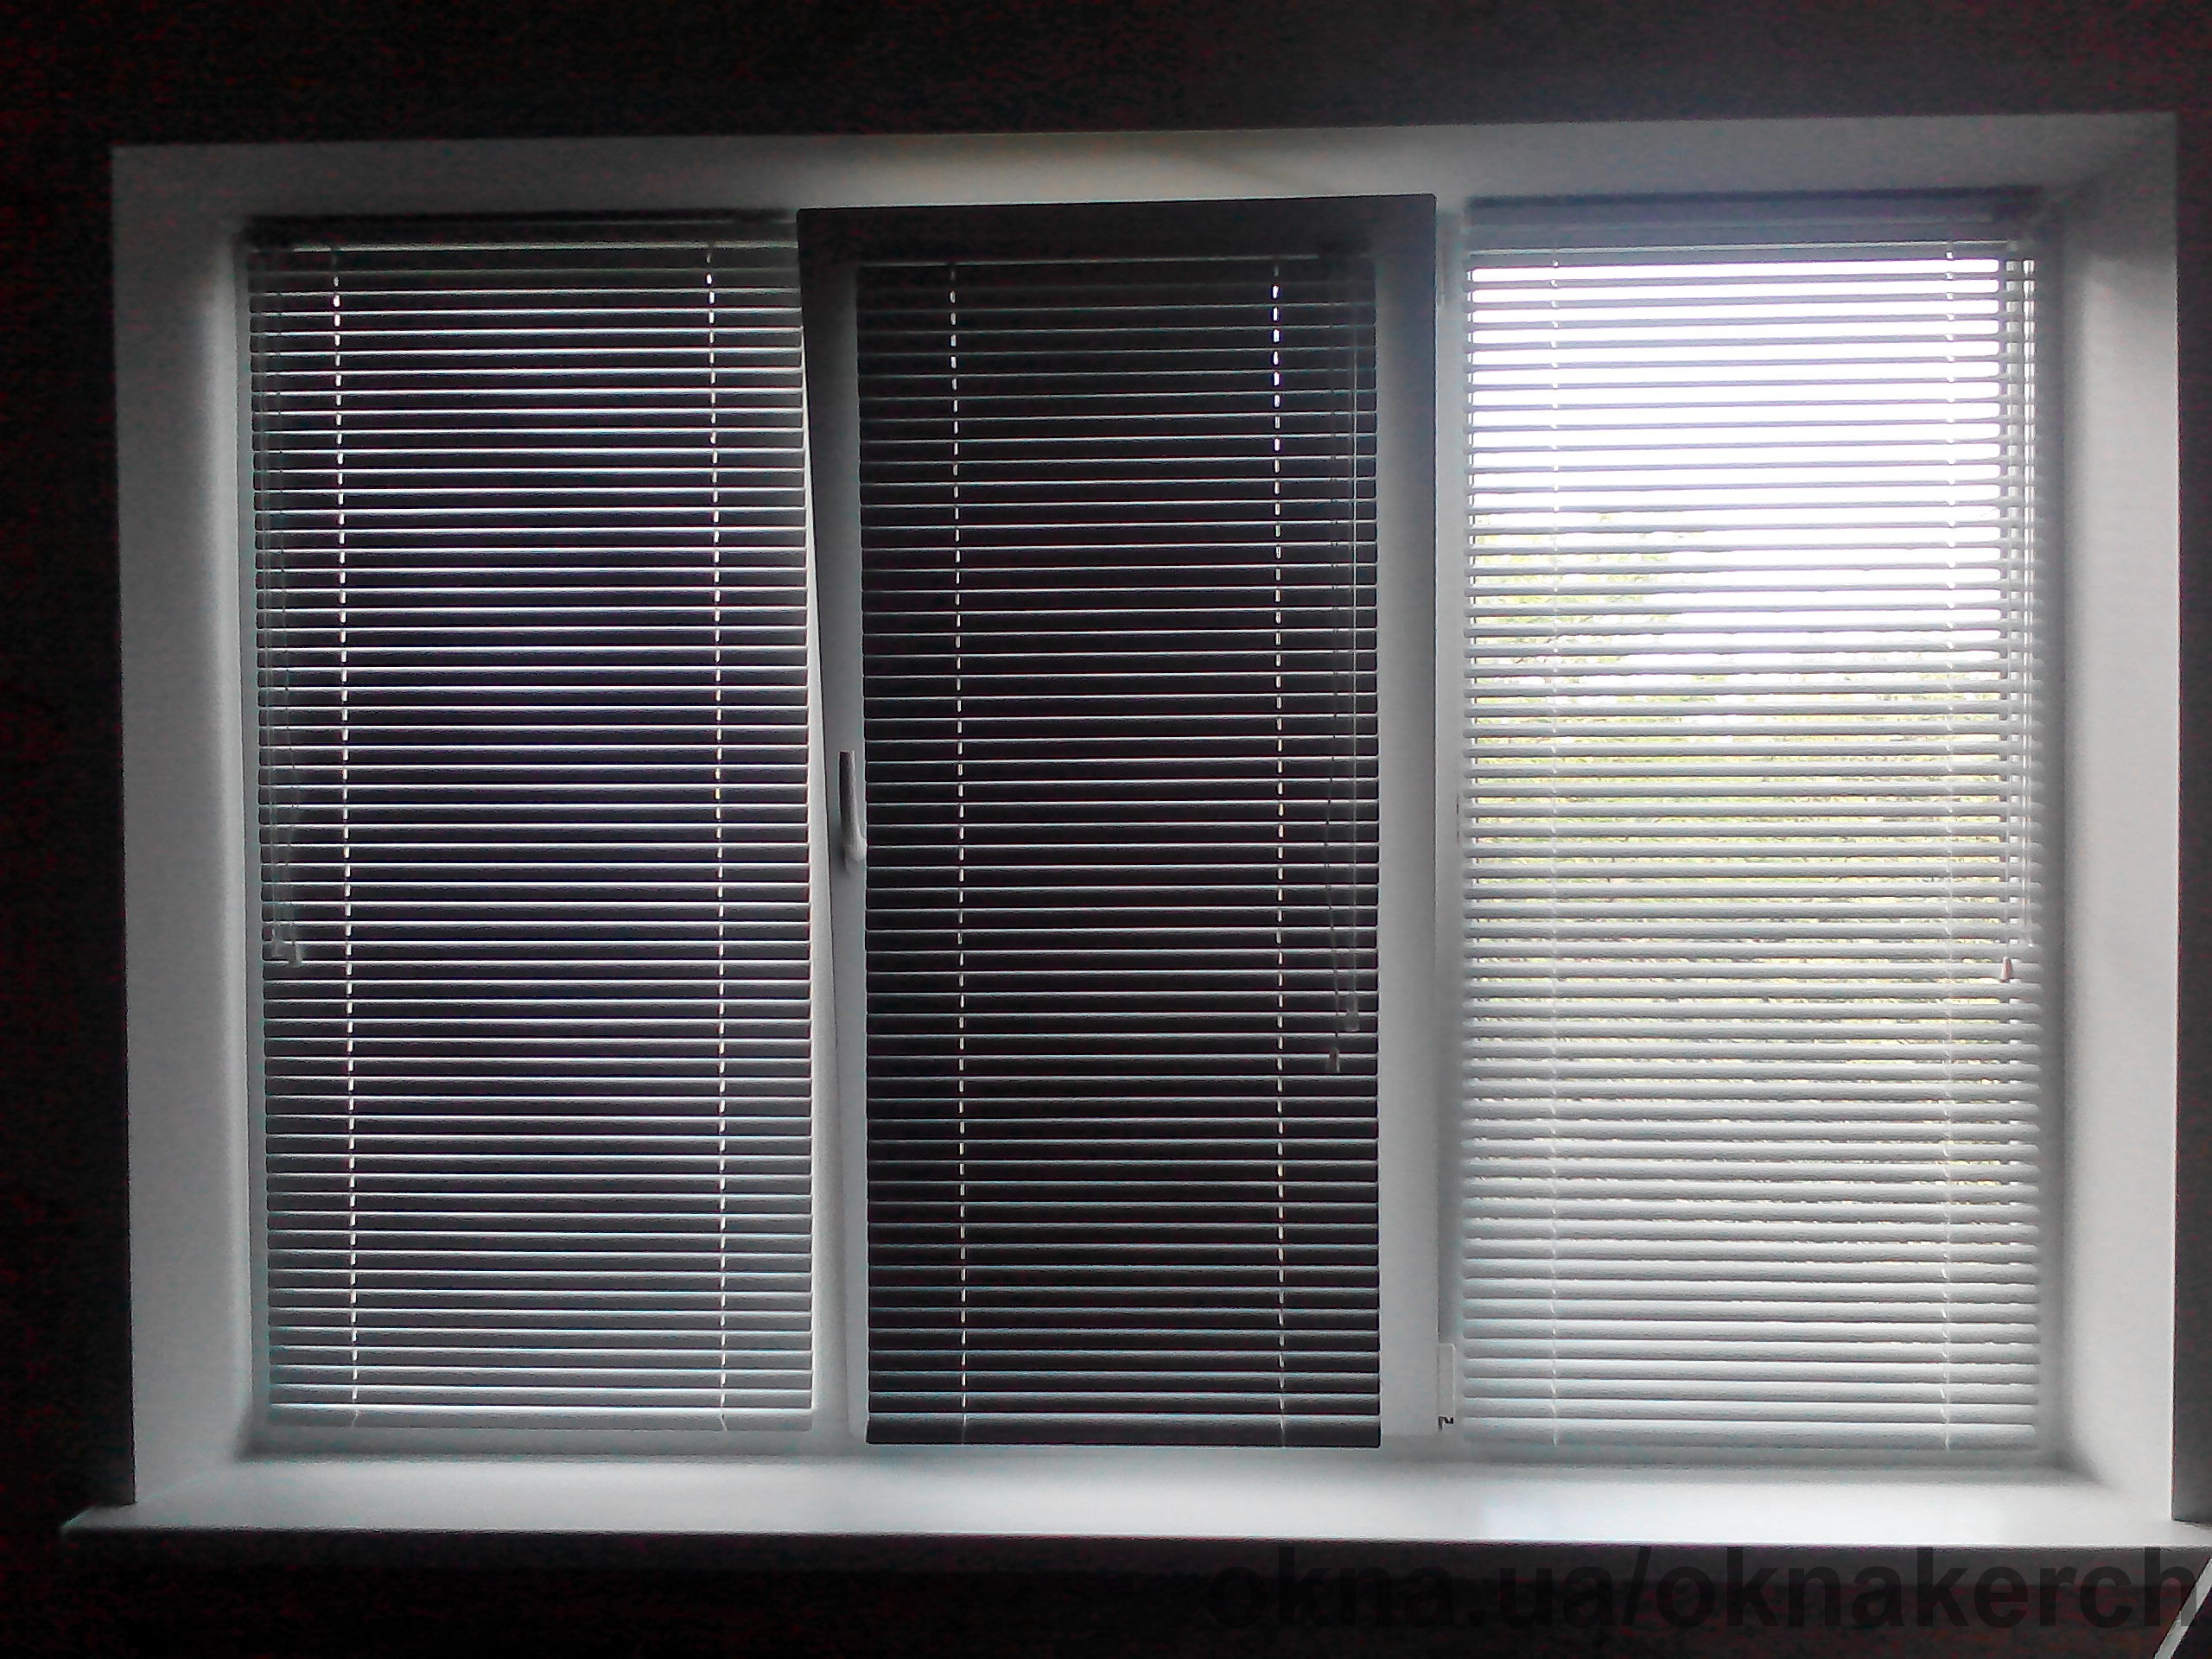 Окно 2100*1400